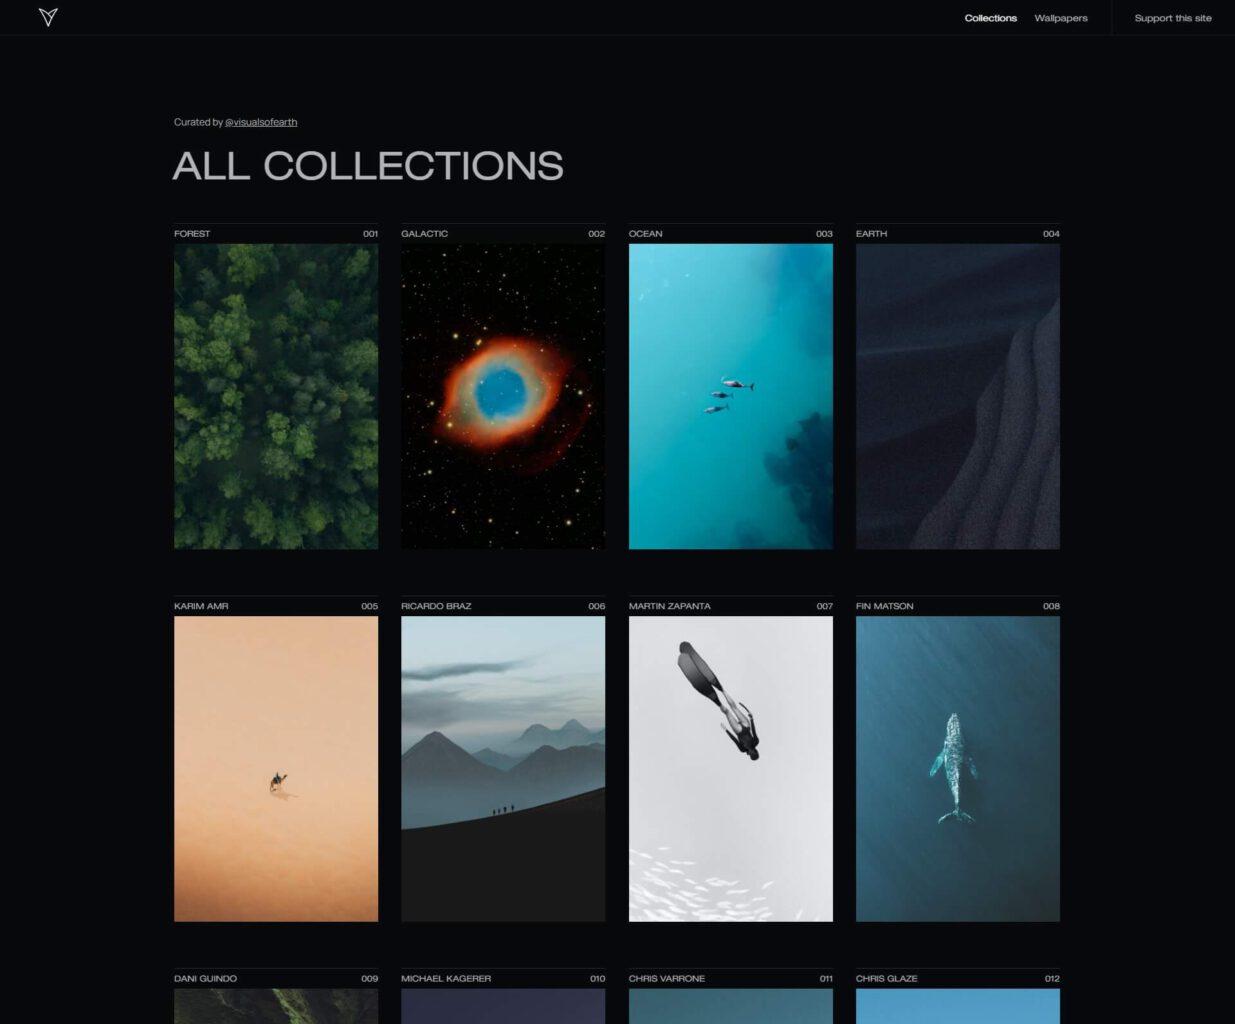 Visuals of Earth: سایتی برای مشاهده و دریافت تصاویر پسزمینه رویایی